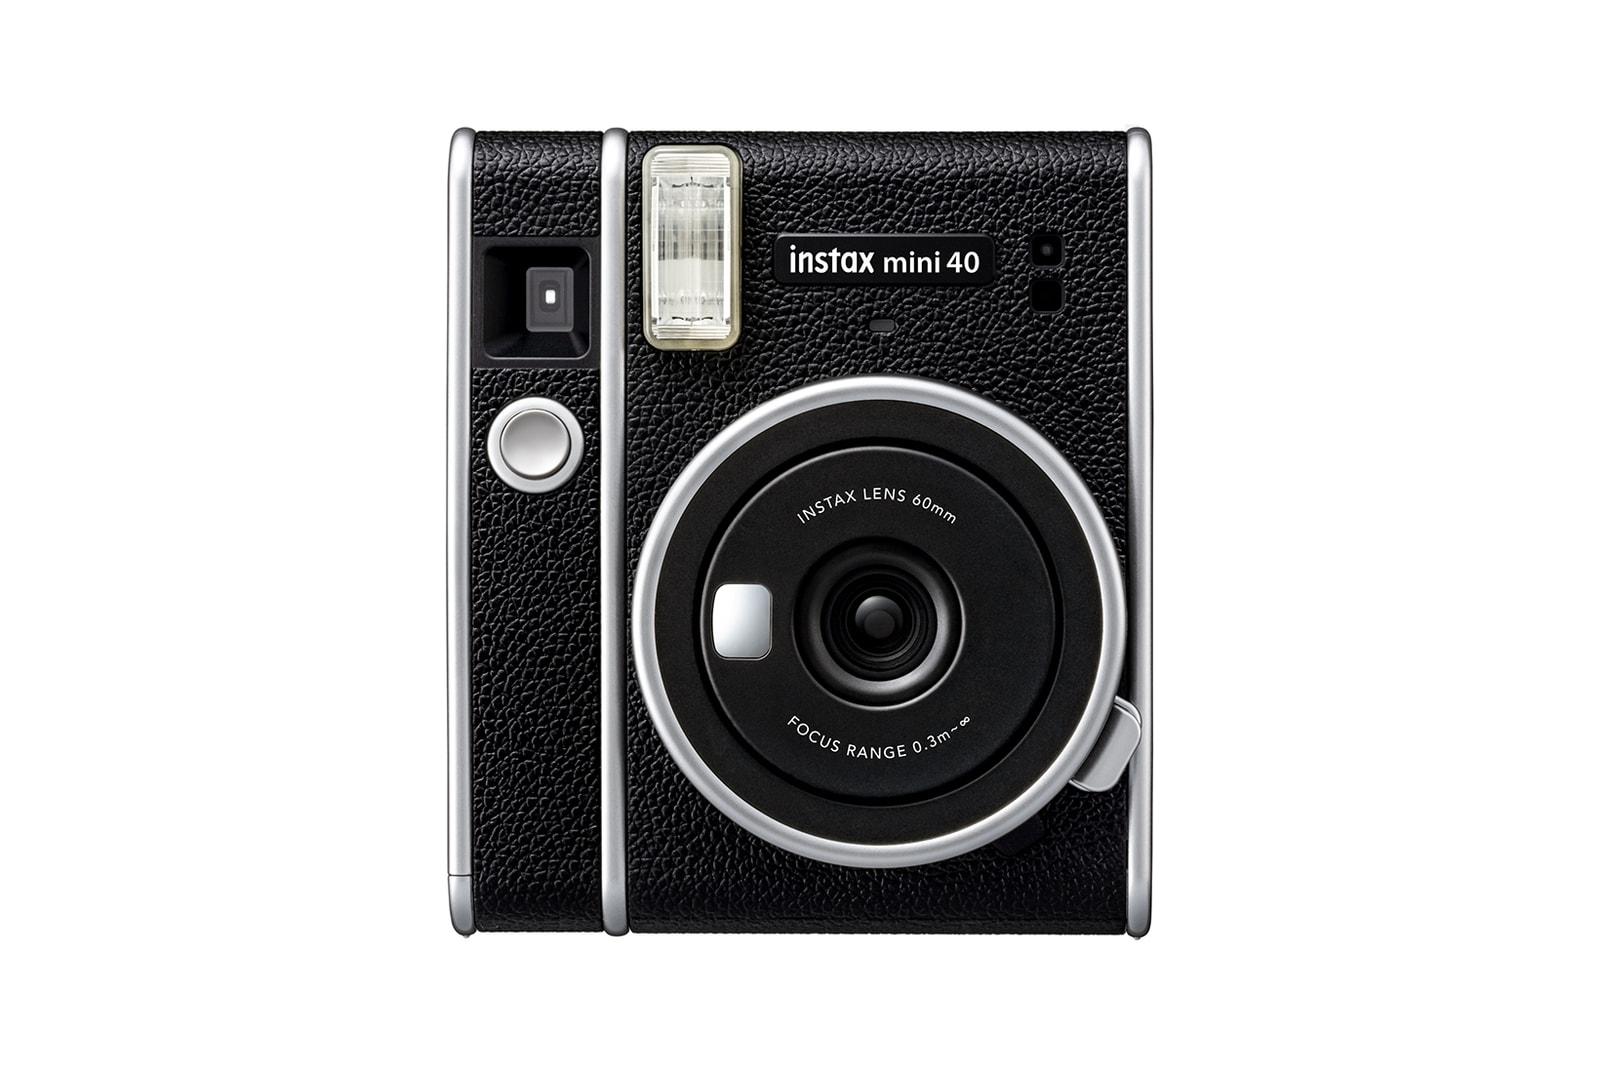 Fujifilm INSTAX MINI 40 Camera